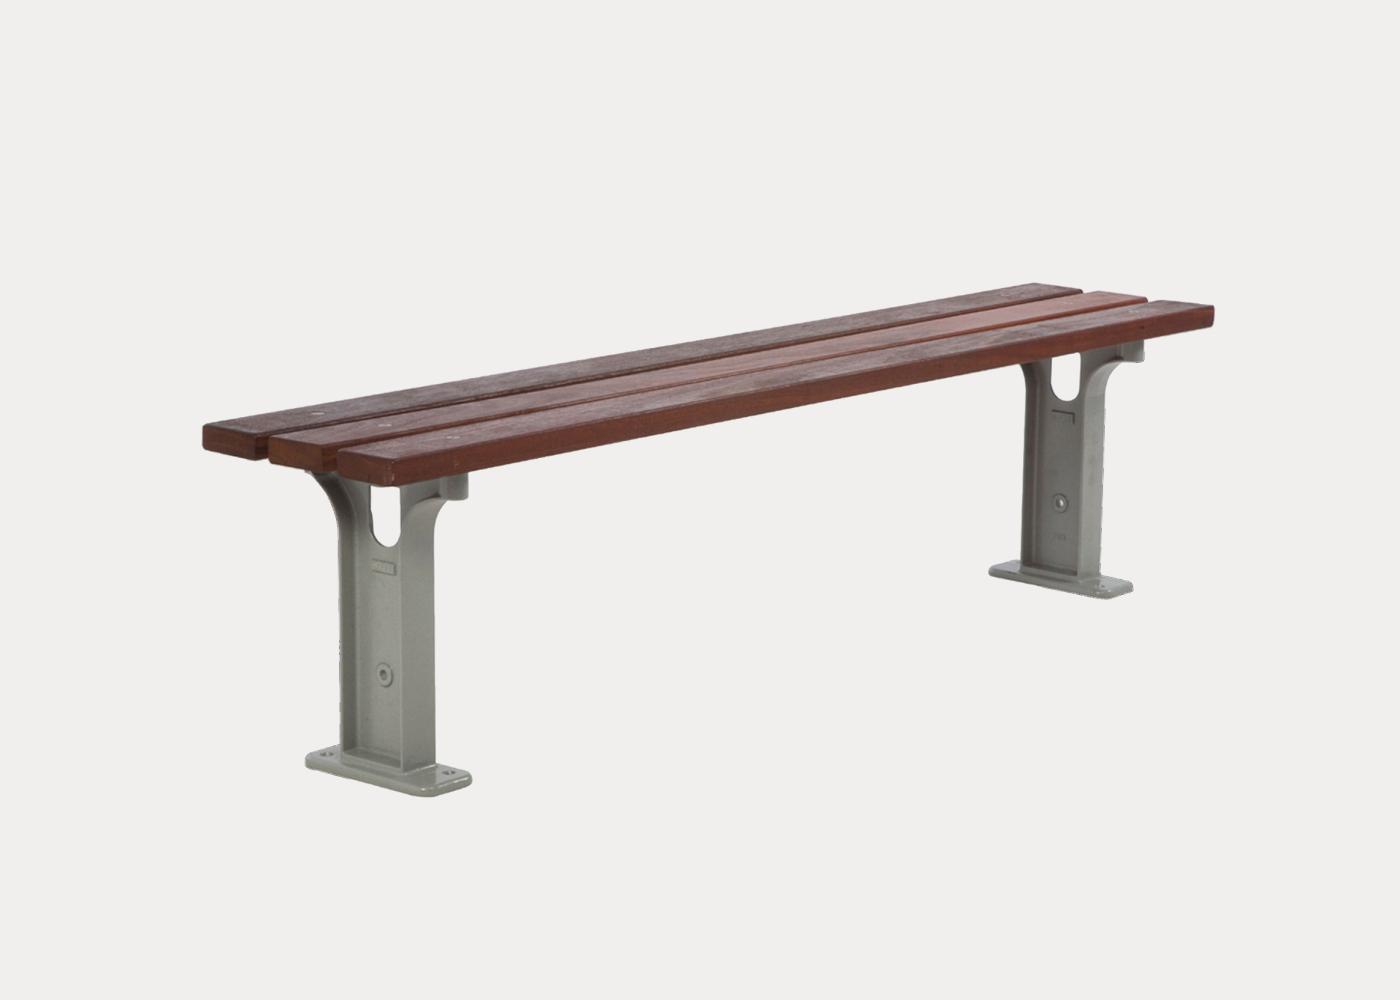 Park Slim Bench | Street Furniture Australia